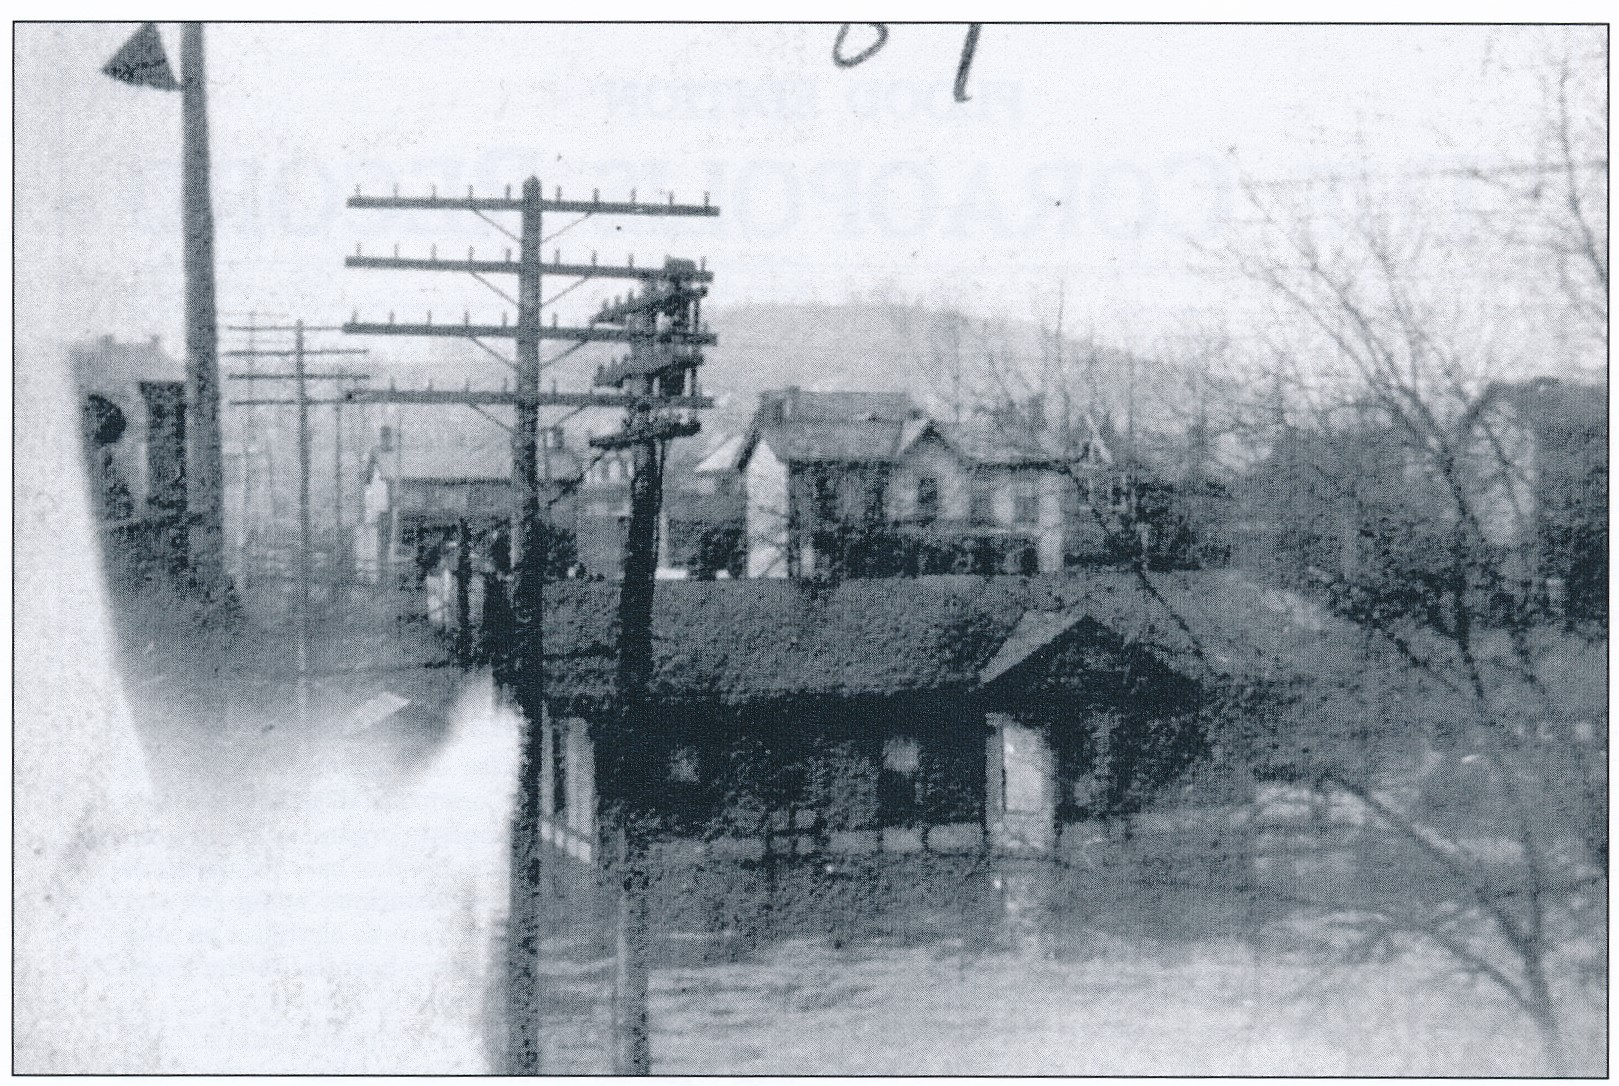 Montour Station 1907 flood (1).jpg